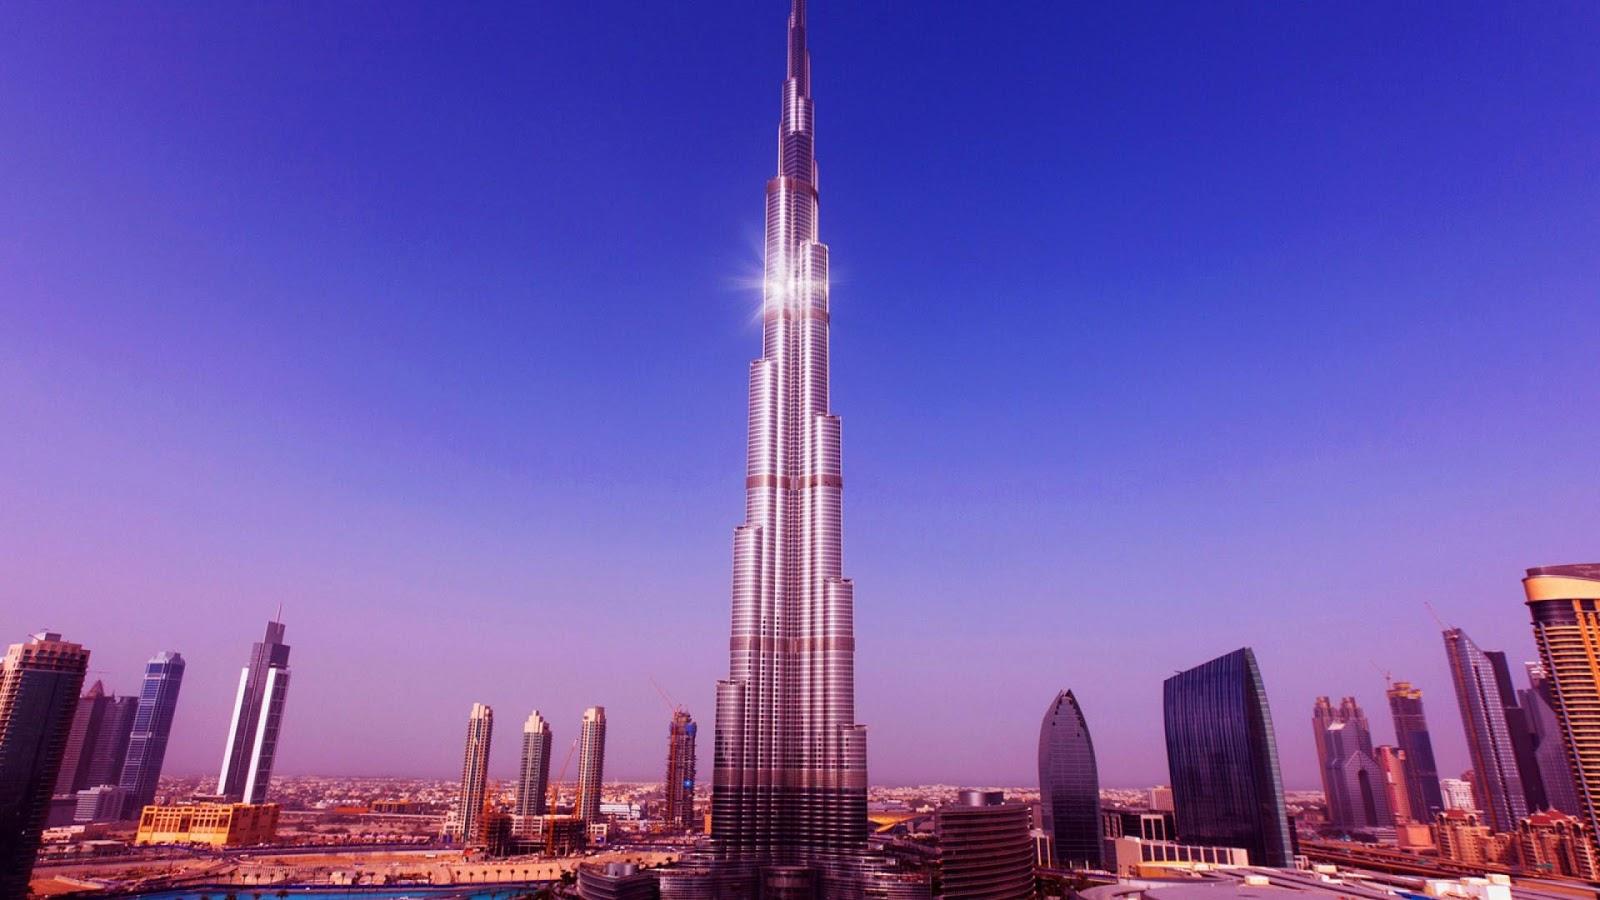 Exterior Home Design Games Burj Khalifa Car And Electronic Wallpaper